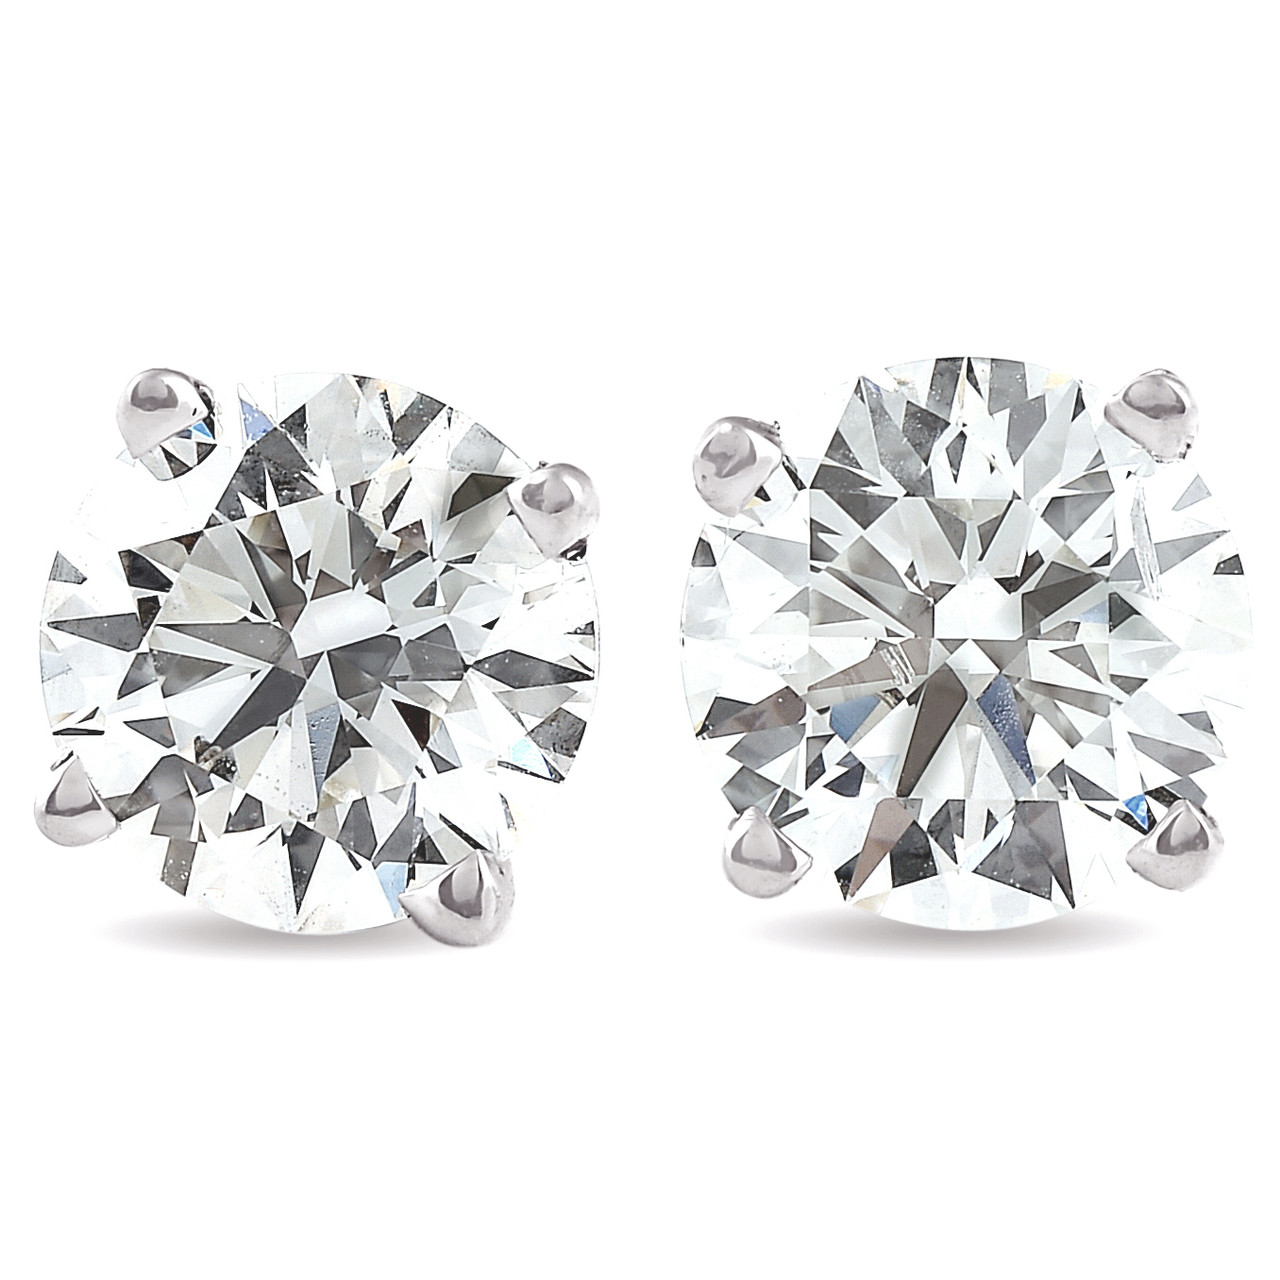 1Ct Round Cut White Diamond Studs Women/'s Pretty Earrings 14K White Gold Over 1